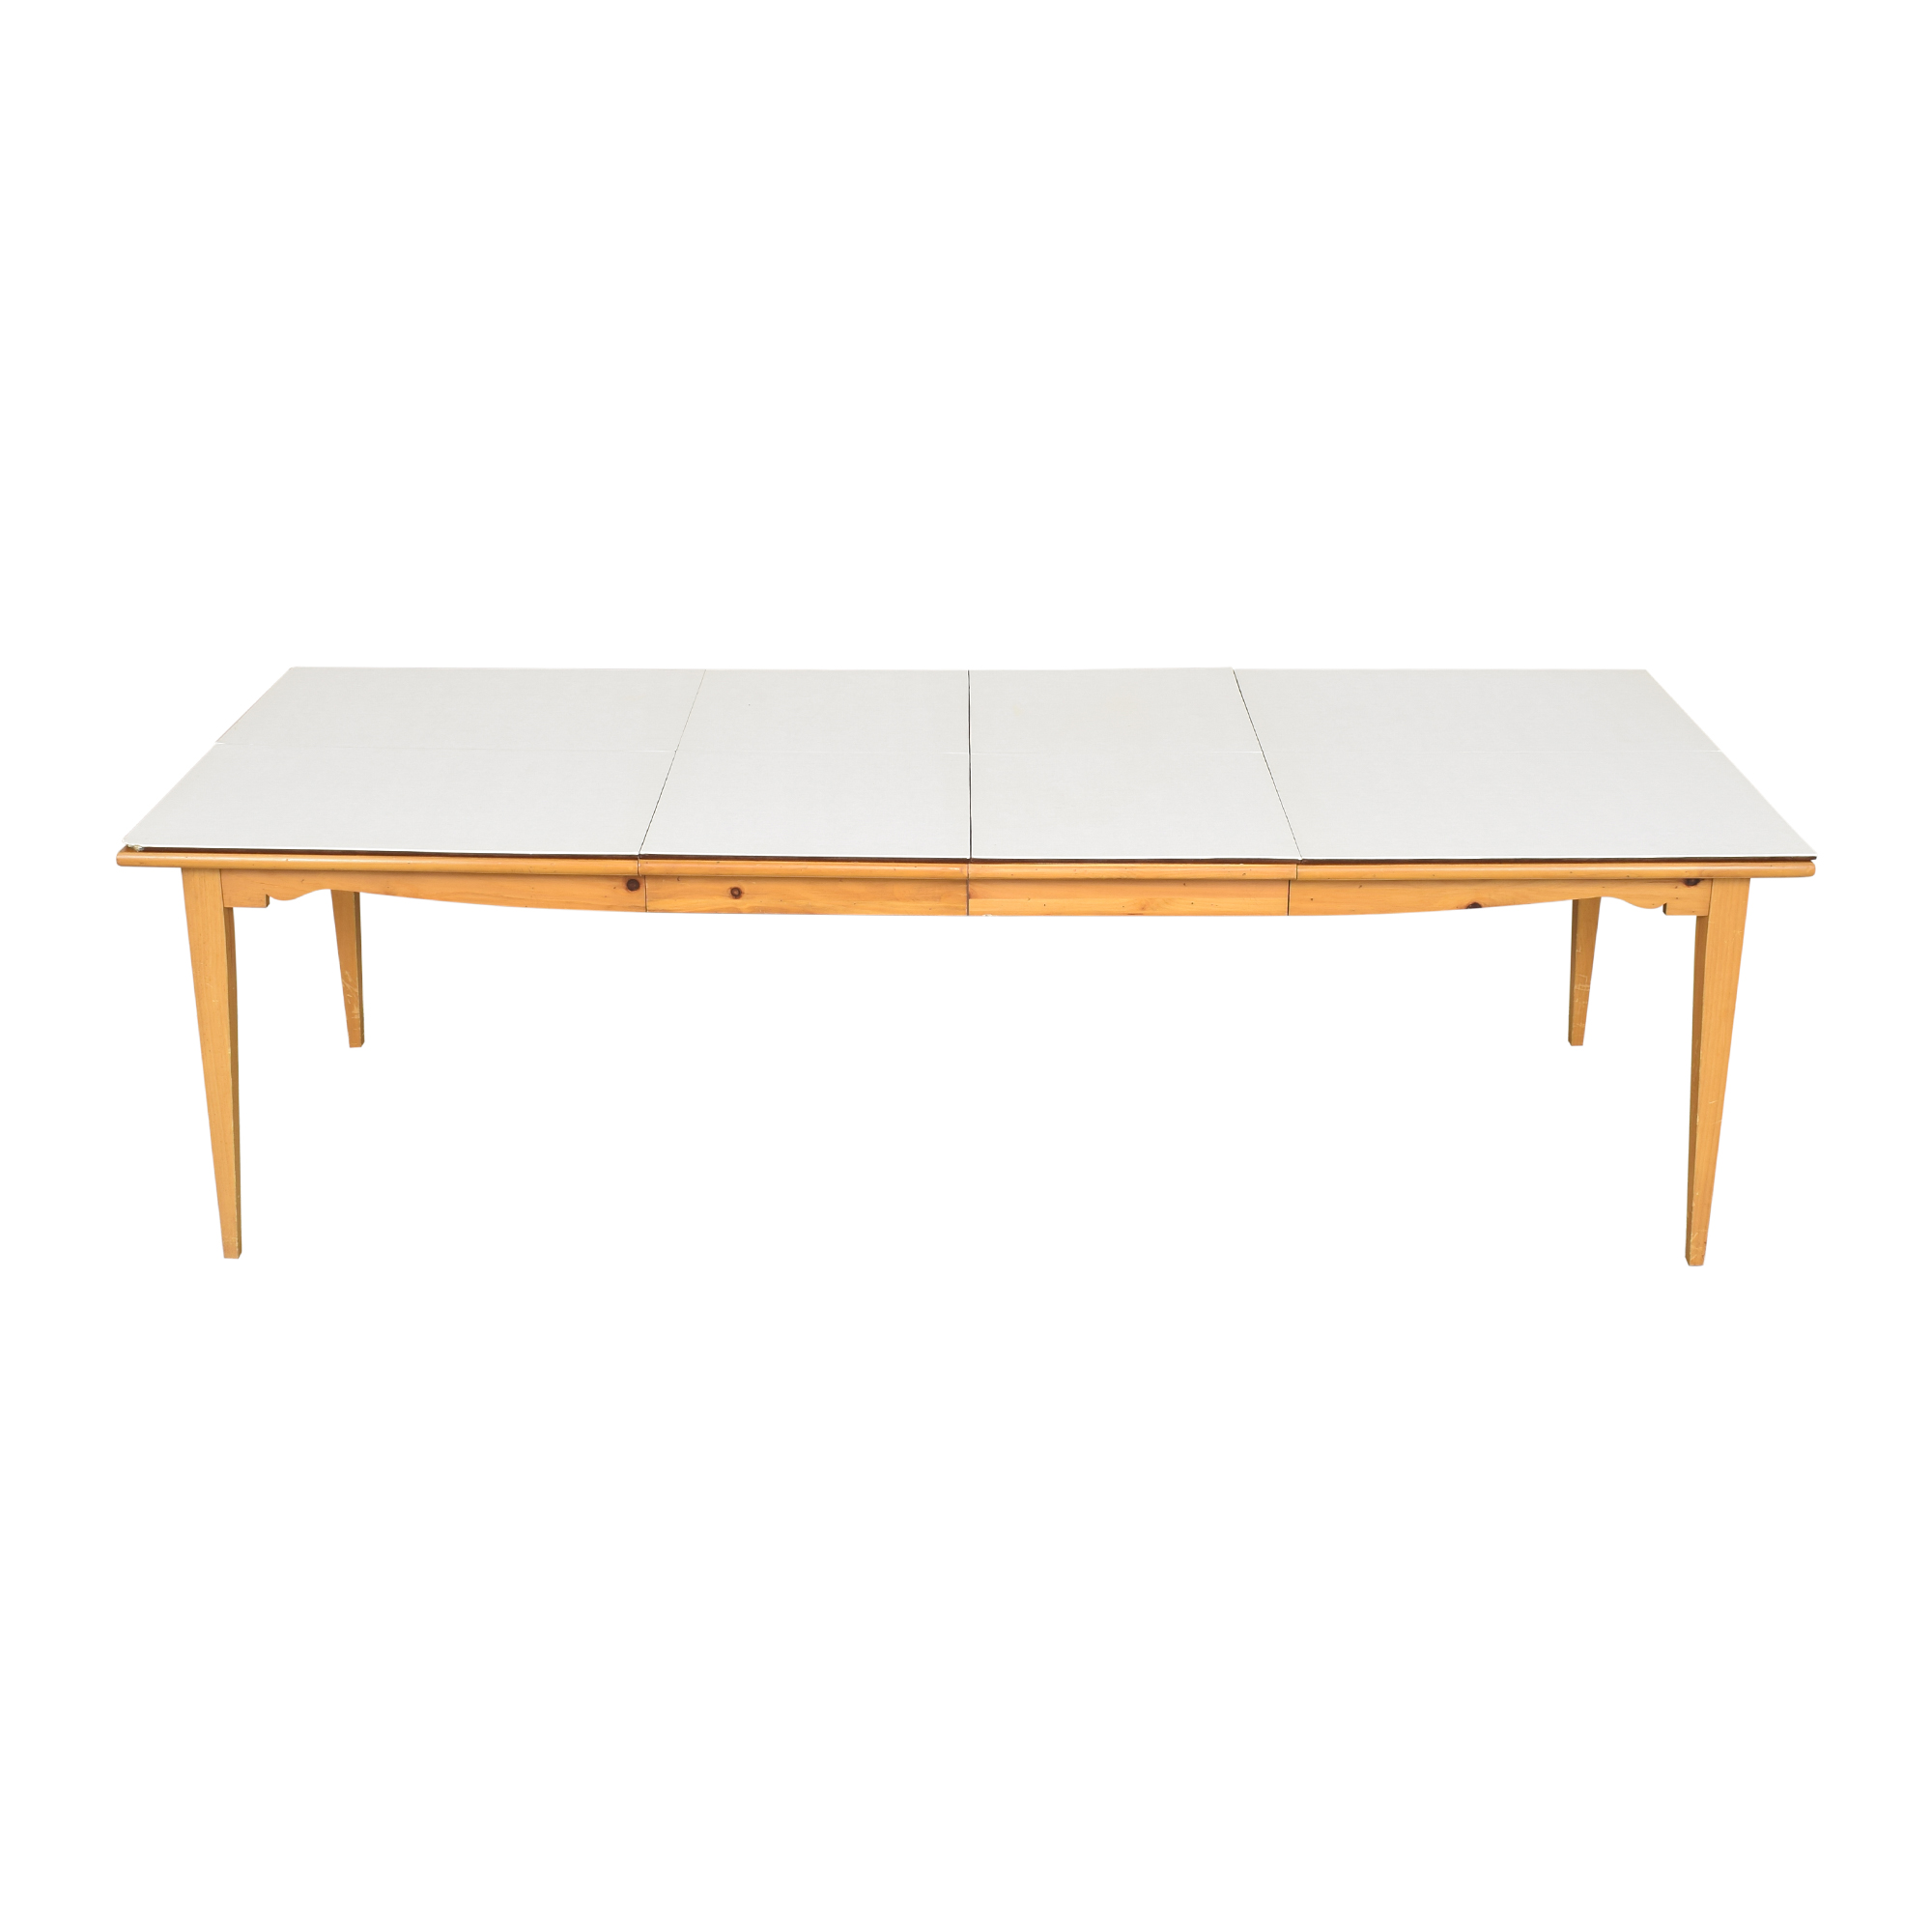 Lane Furniture Lane Extendable Rectangular Dining Table dimensions